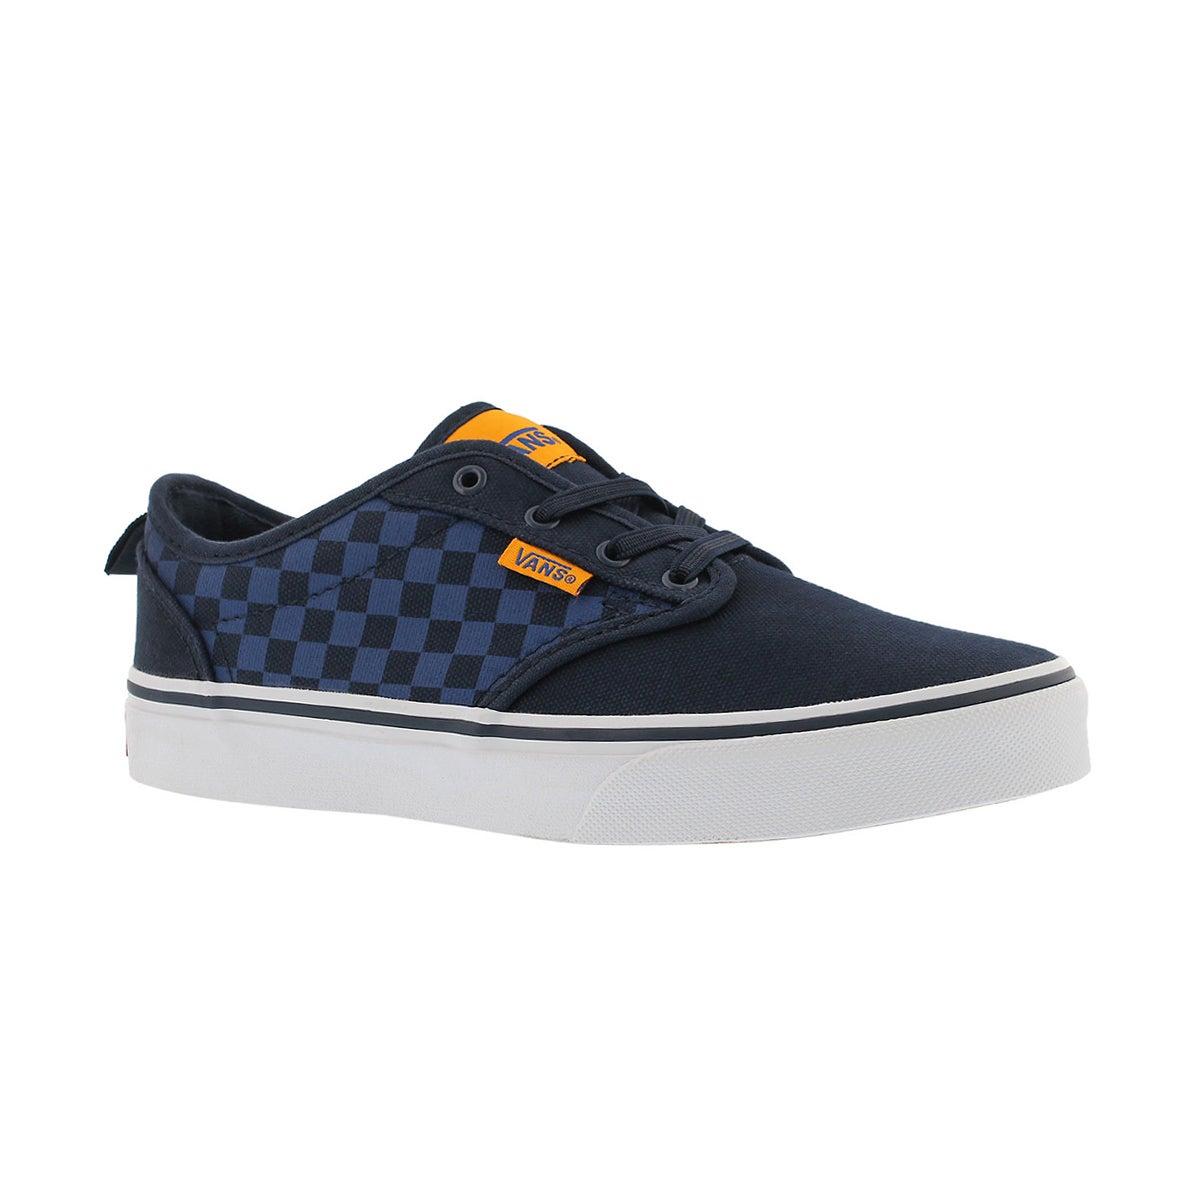 Boys' ATWOOD blue/orange canvas slip on sneakers